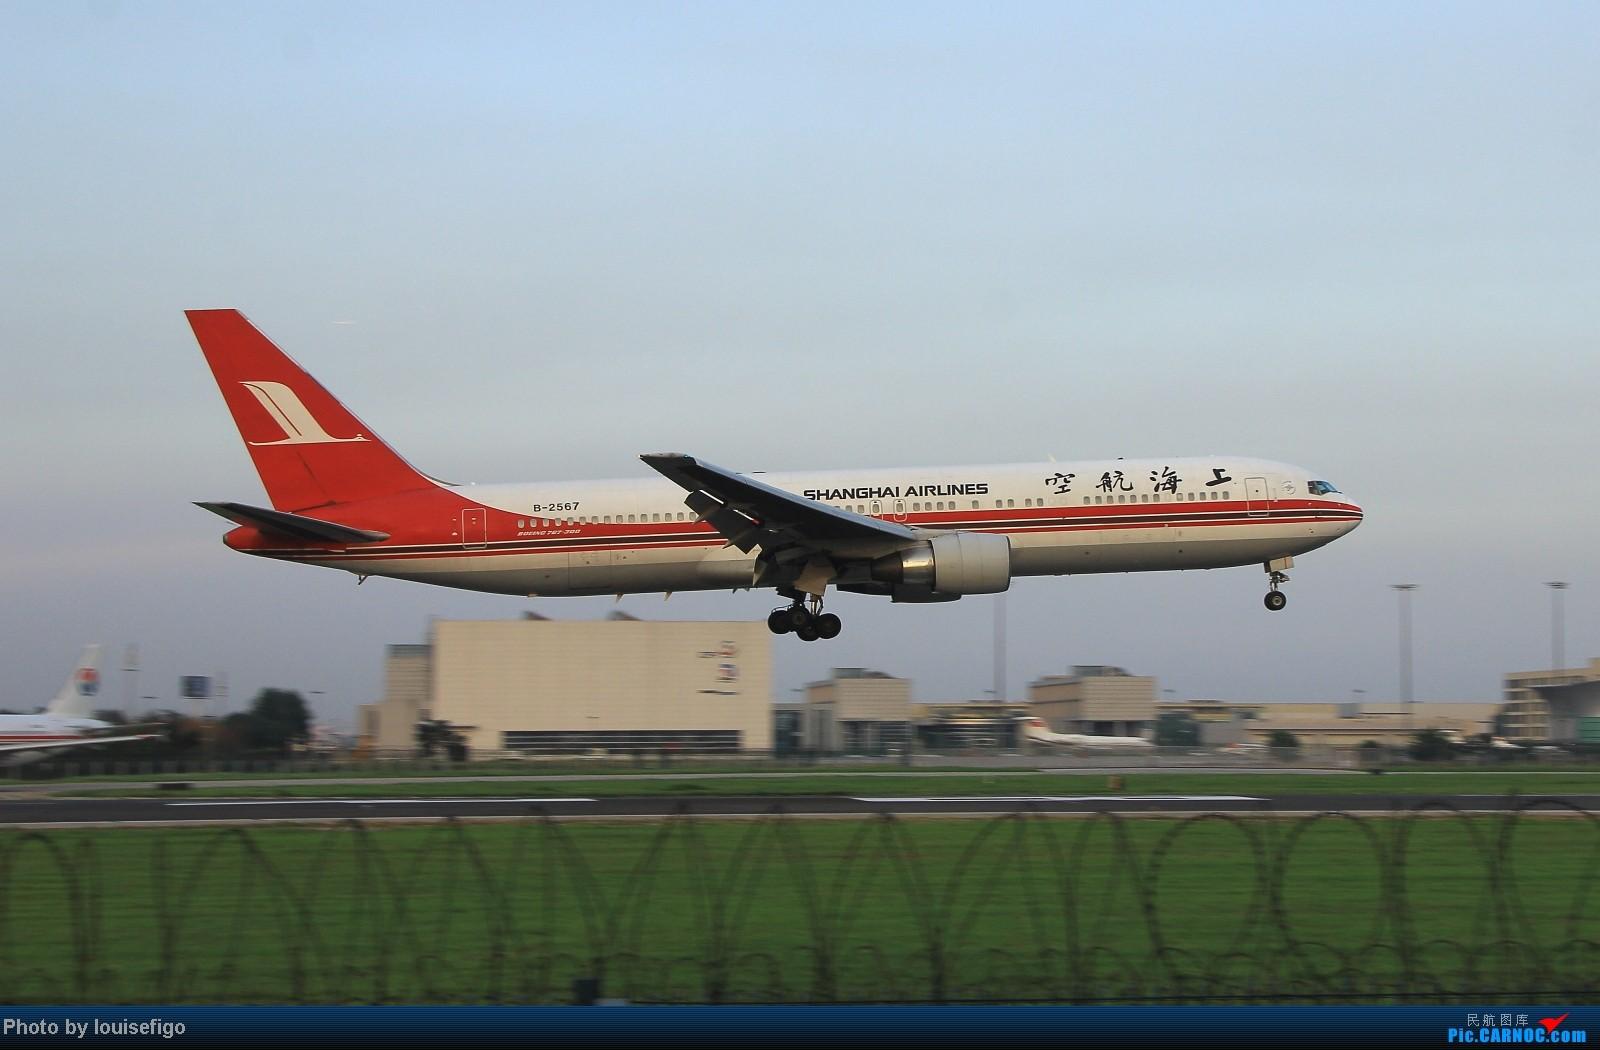 Re:[原创]闲来无事天气闷,发点冷饭自娱乐!!!PEK西跑的降落杂图~发到哪儿是哪儿啊!随心情! BOEING 767-300 B-2567 北京首都国际机场